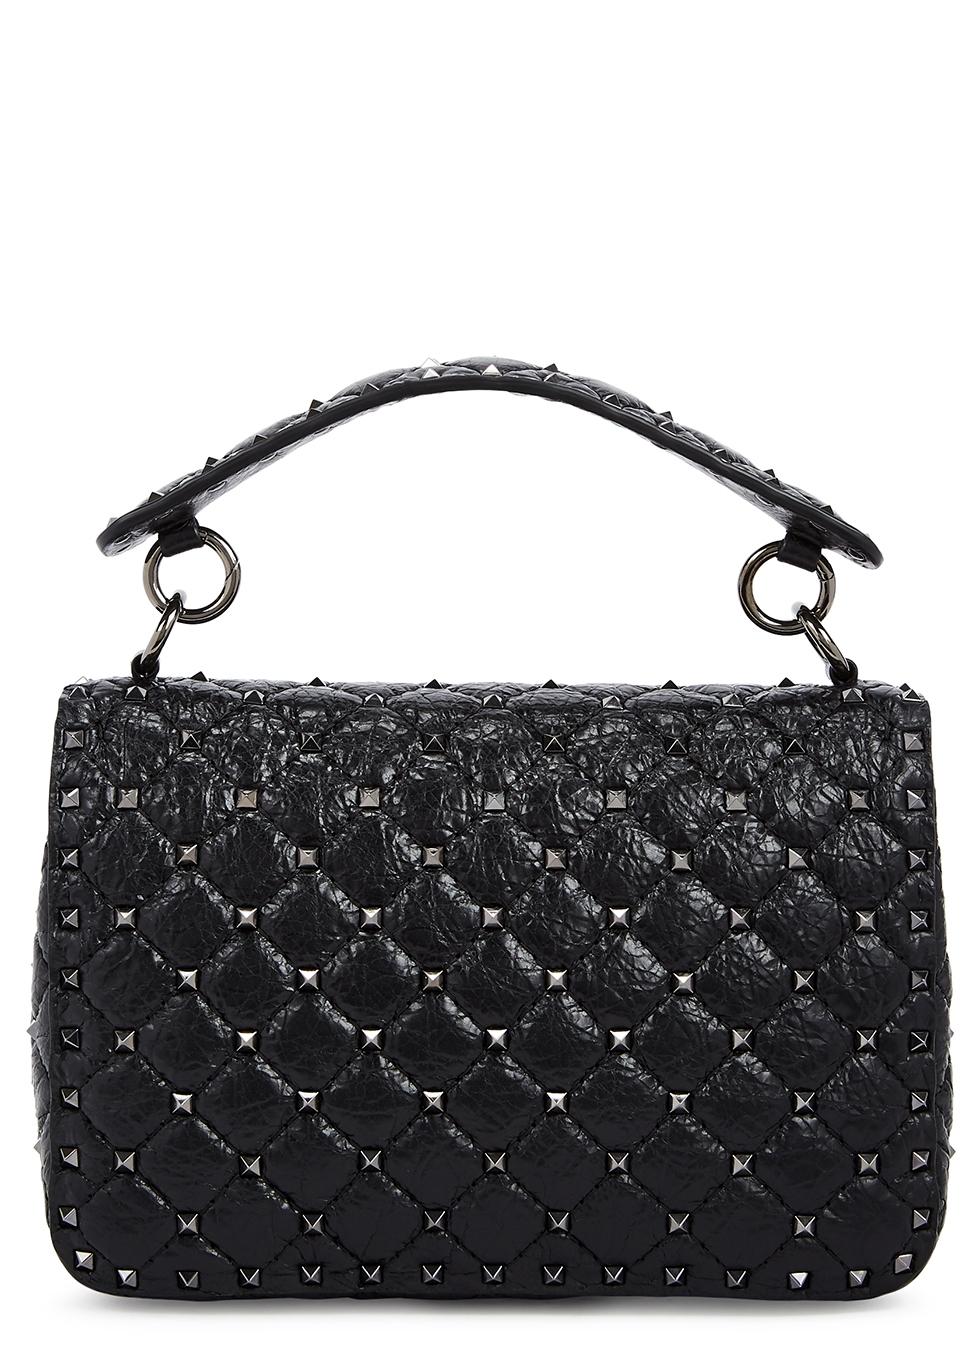 Rockstud Spike medium shoulder bag - Valentino Garavani